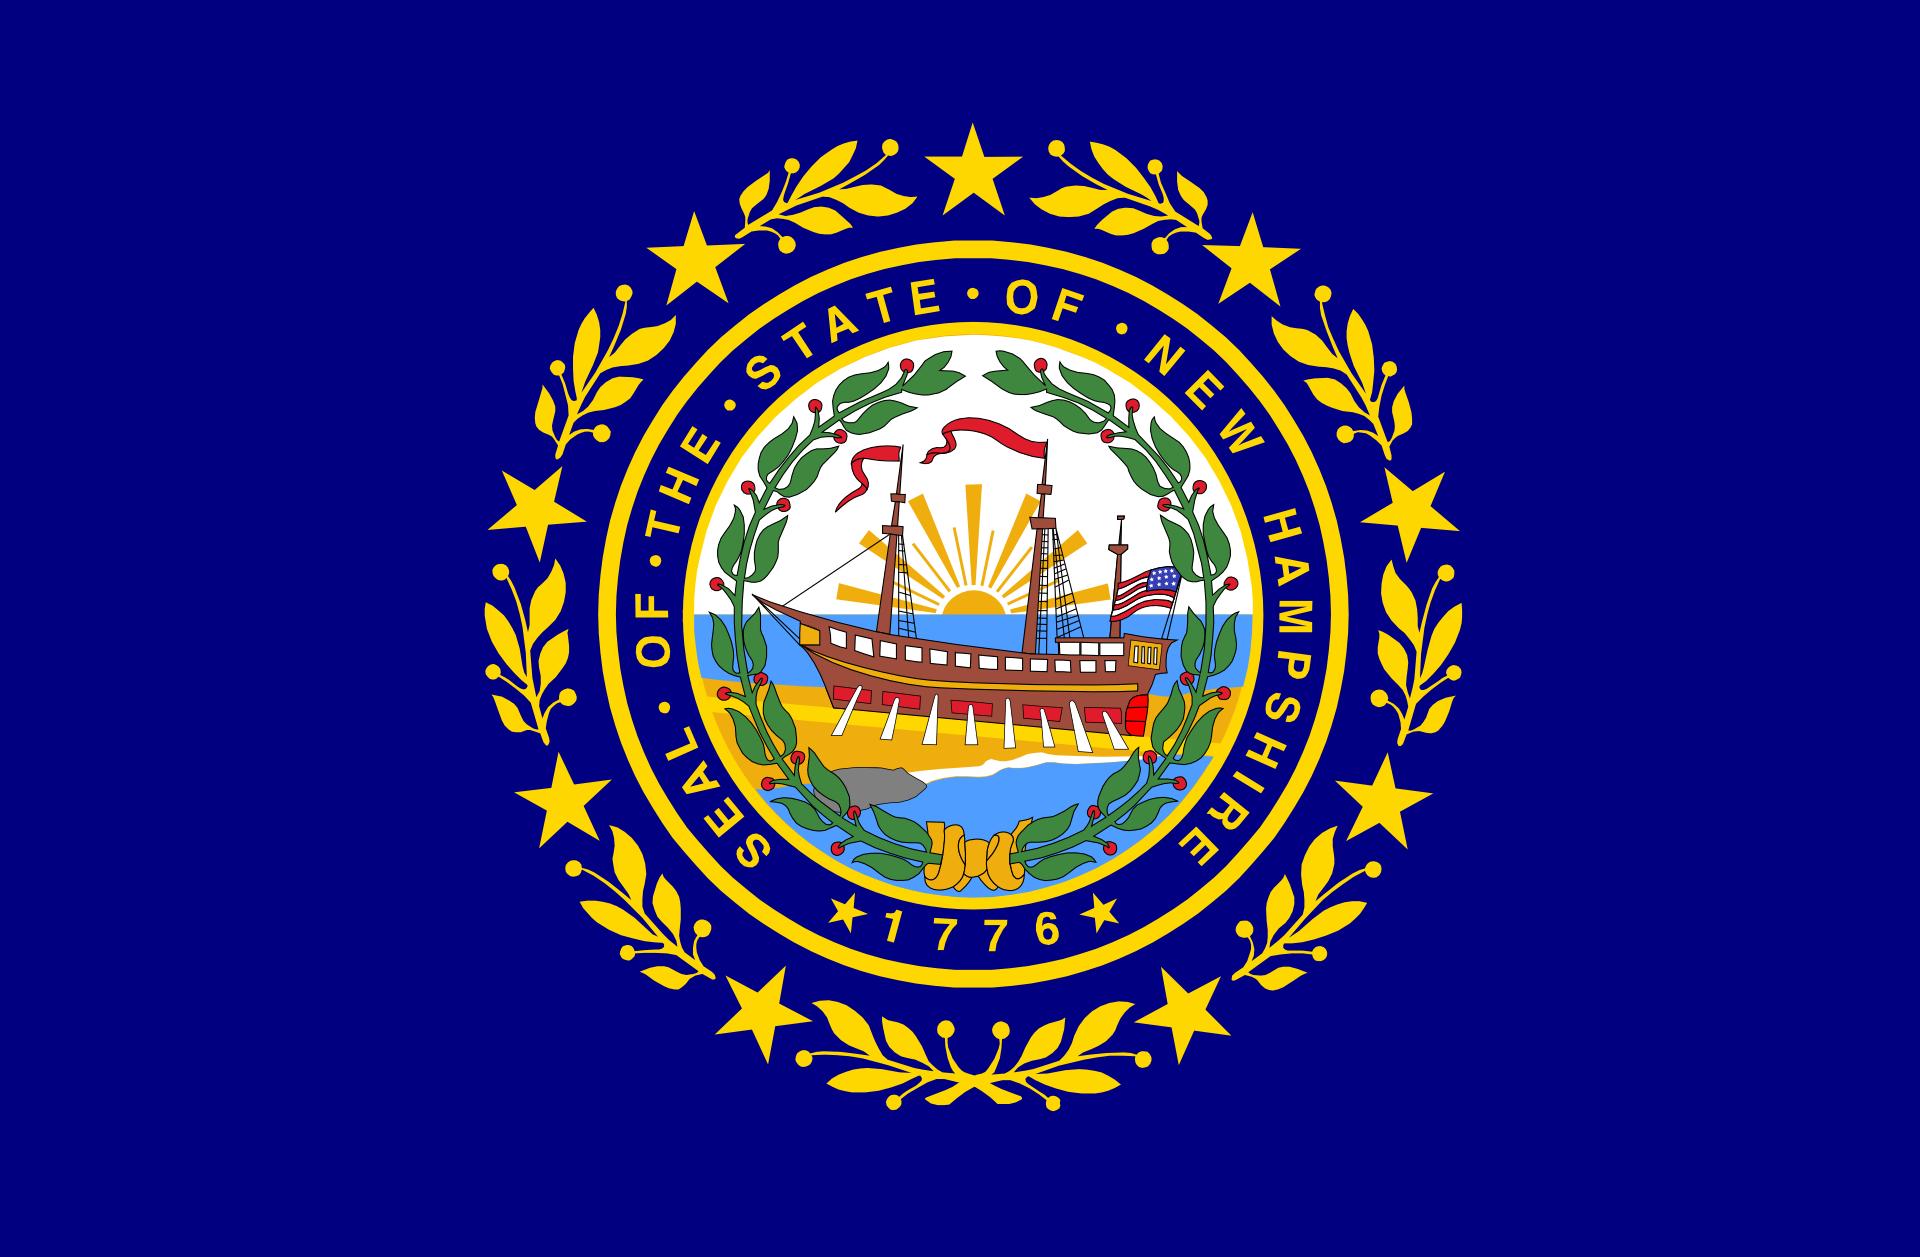 New Hampshire state emblem and New Hampshire Slot Machine Casino Gambling.